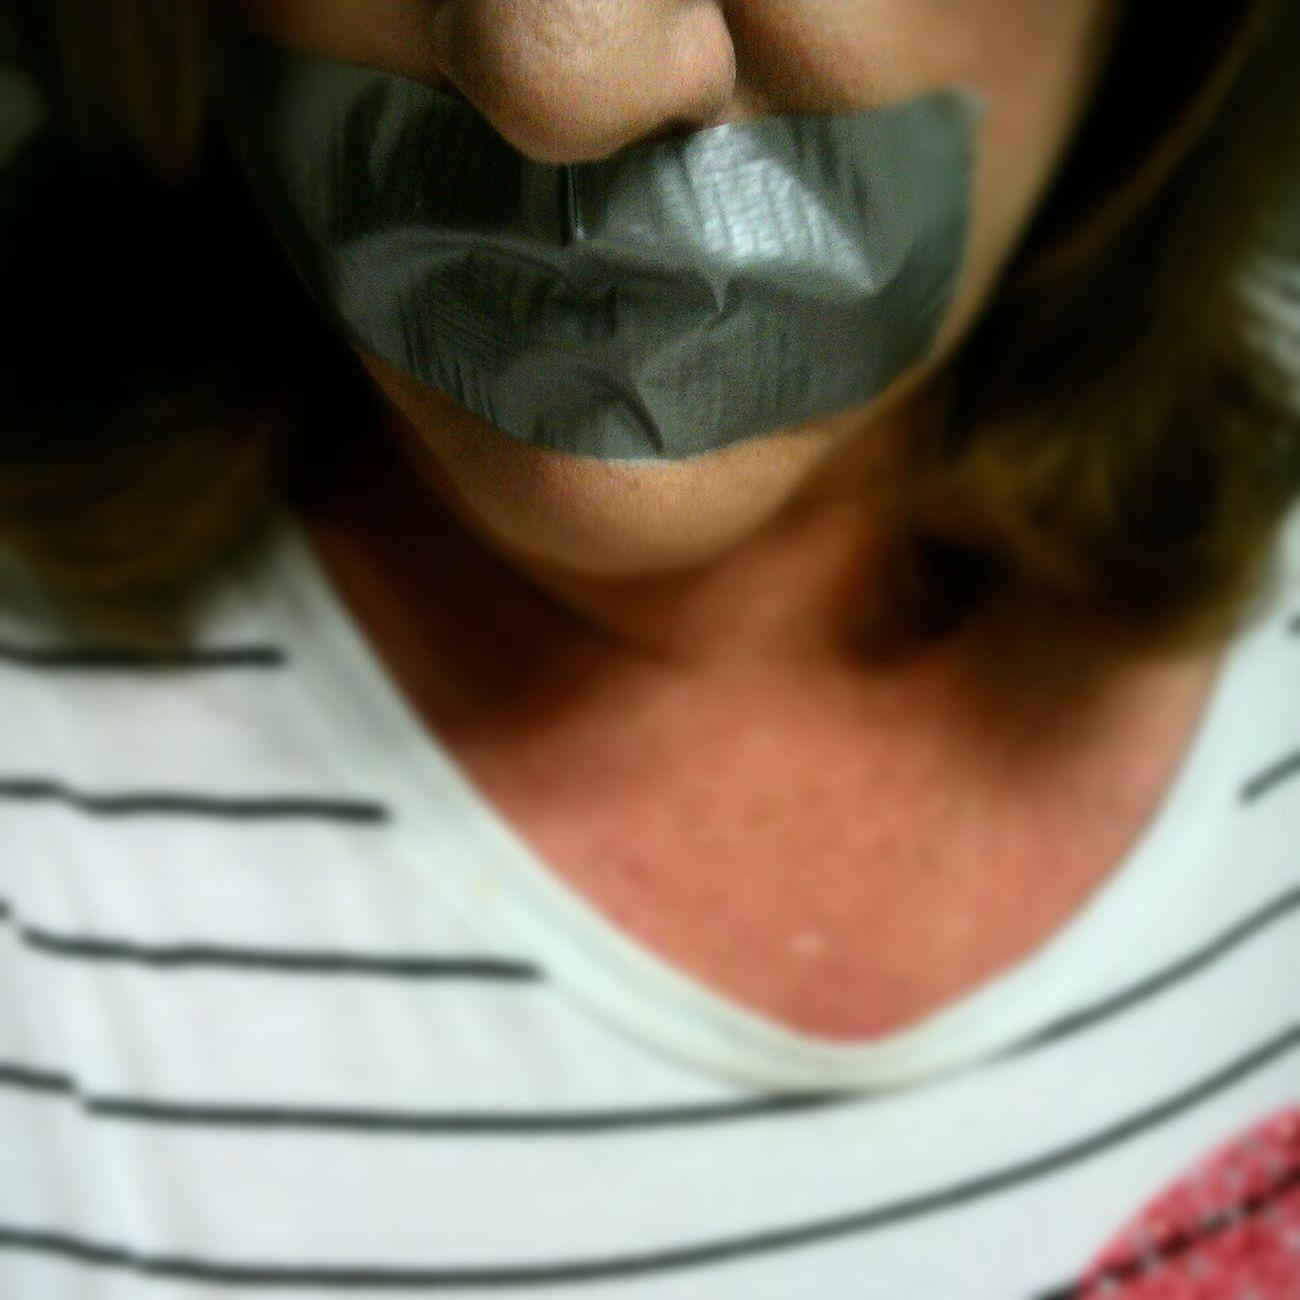 The Censor Hall Of Shame